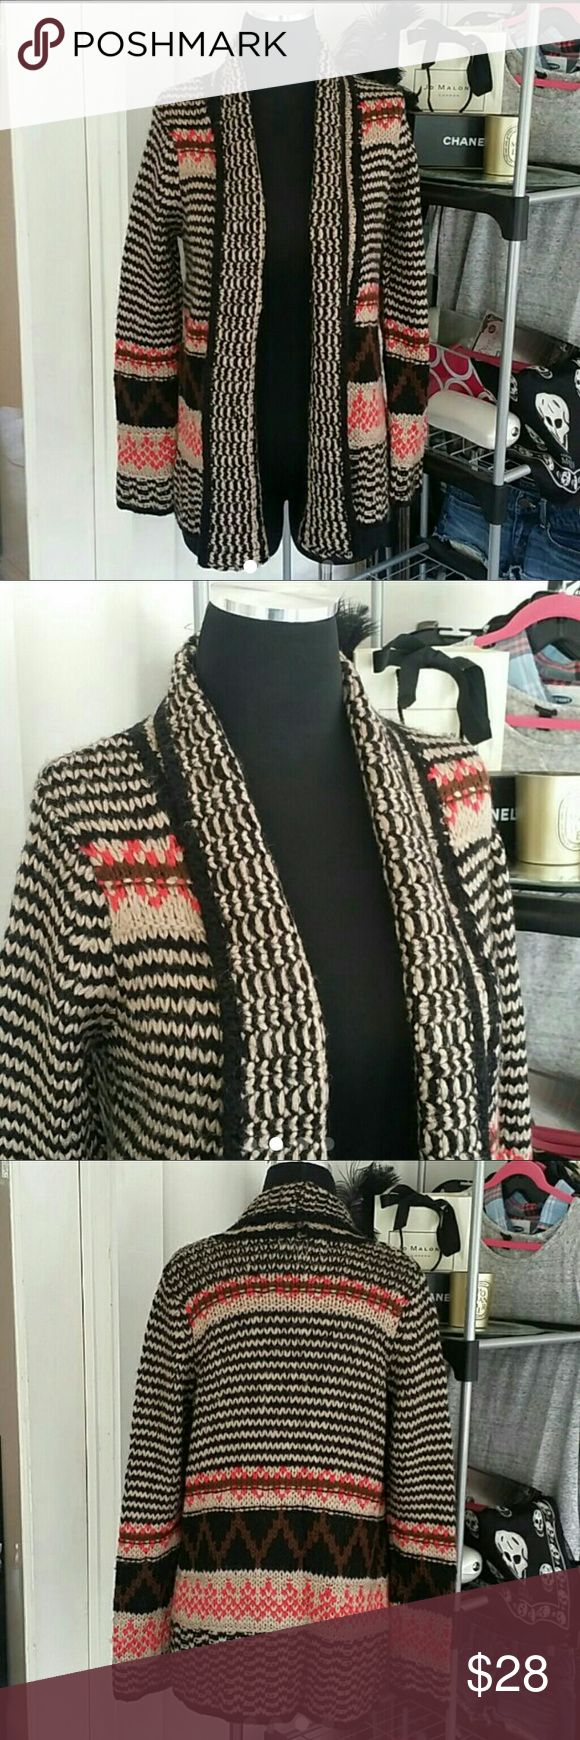 PINK REPUBLIC TRIBAL CARDIGAN SZ M Pink Republic Tribal / Aztec Sweater Cardigan Size Medium. Material is 100 % Acrylic. Pink Rose Sweaters Cardigans